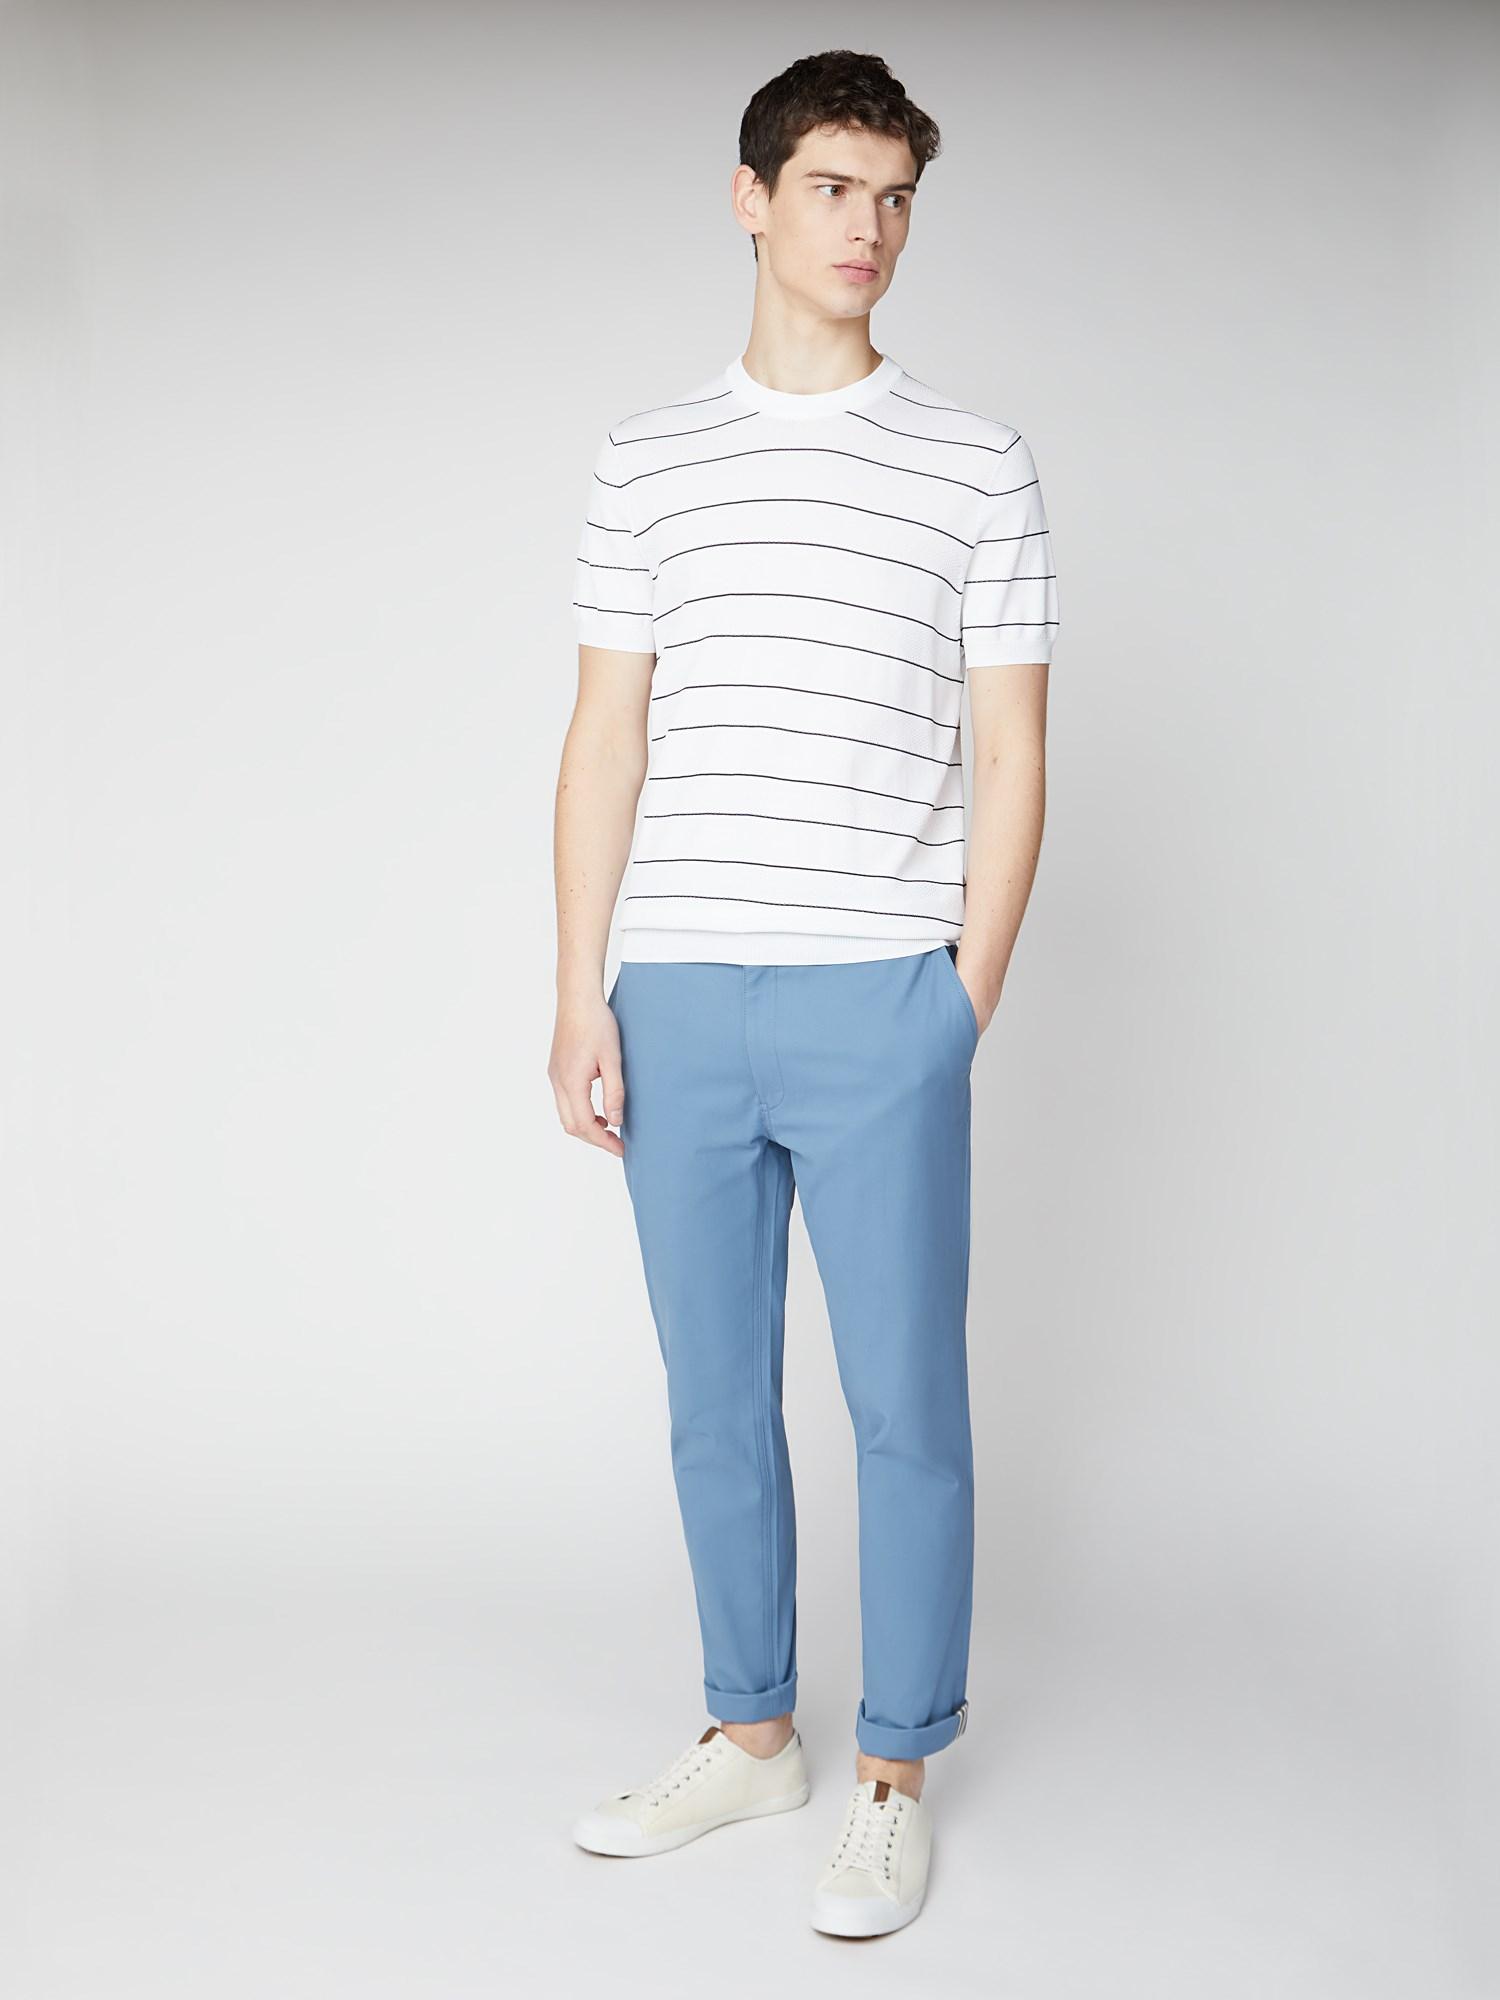 Crew Neck Stripe Knit Tee